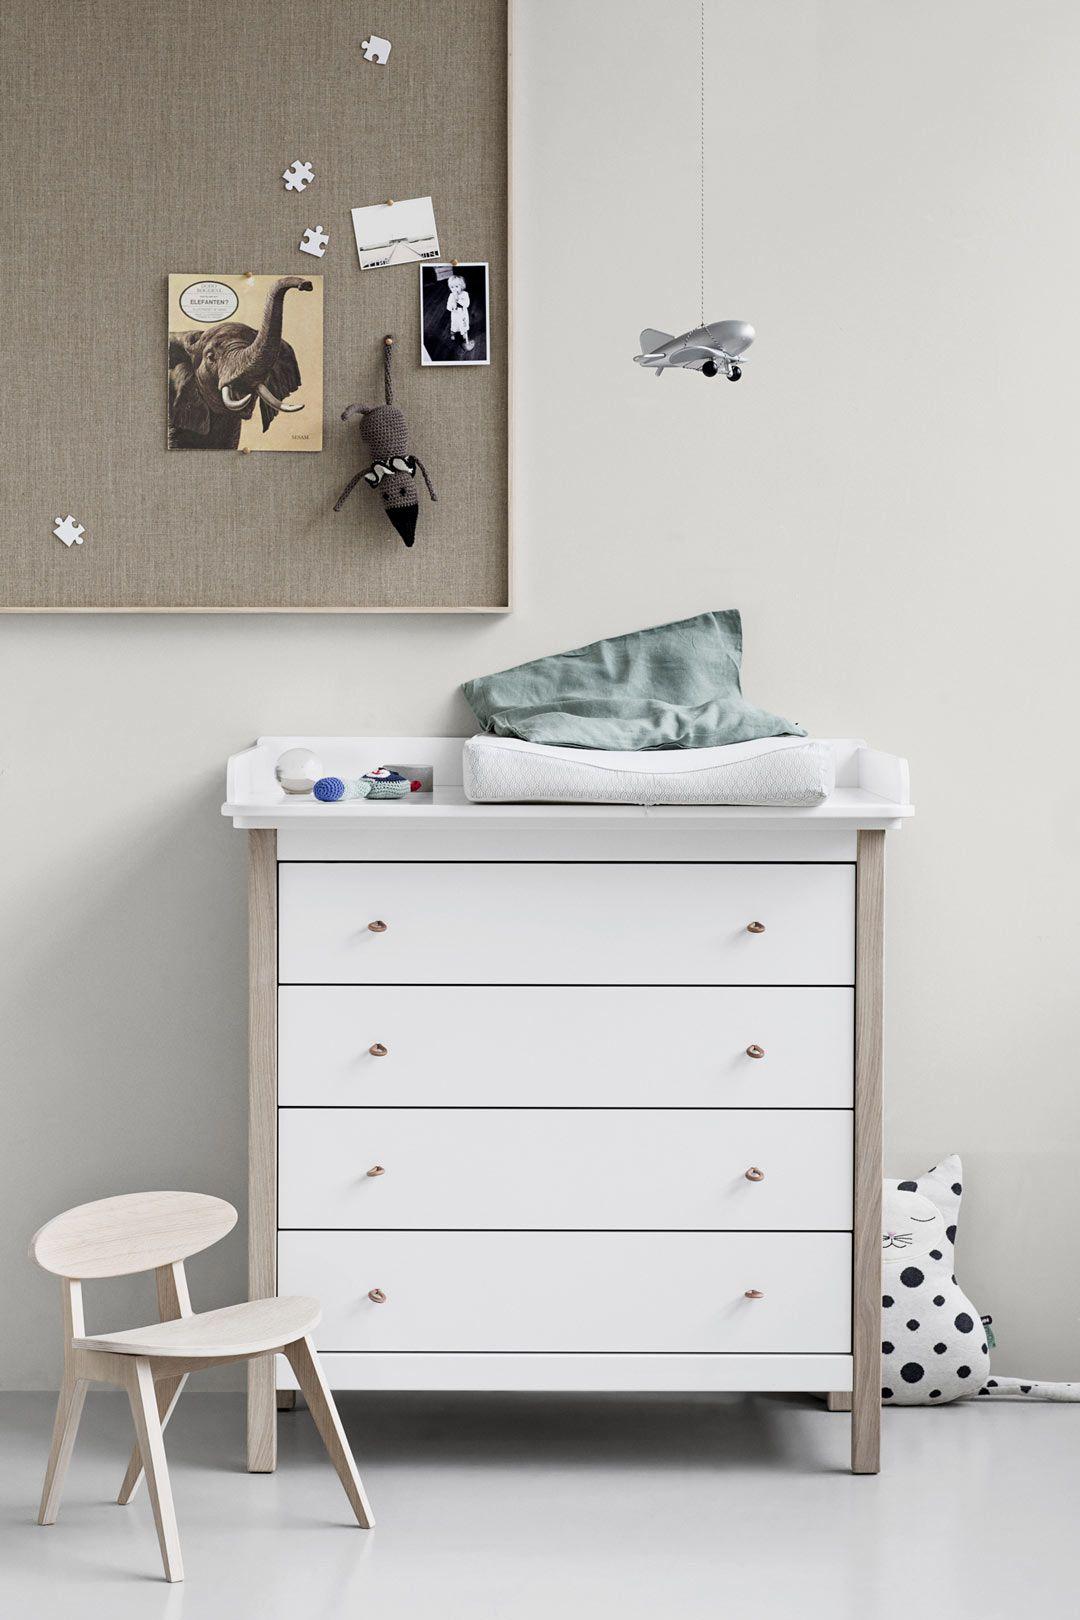 C Moda De Madera Wood De Oliver Furniture Xilo Pinterest  # Muebles Mudadores